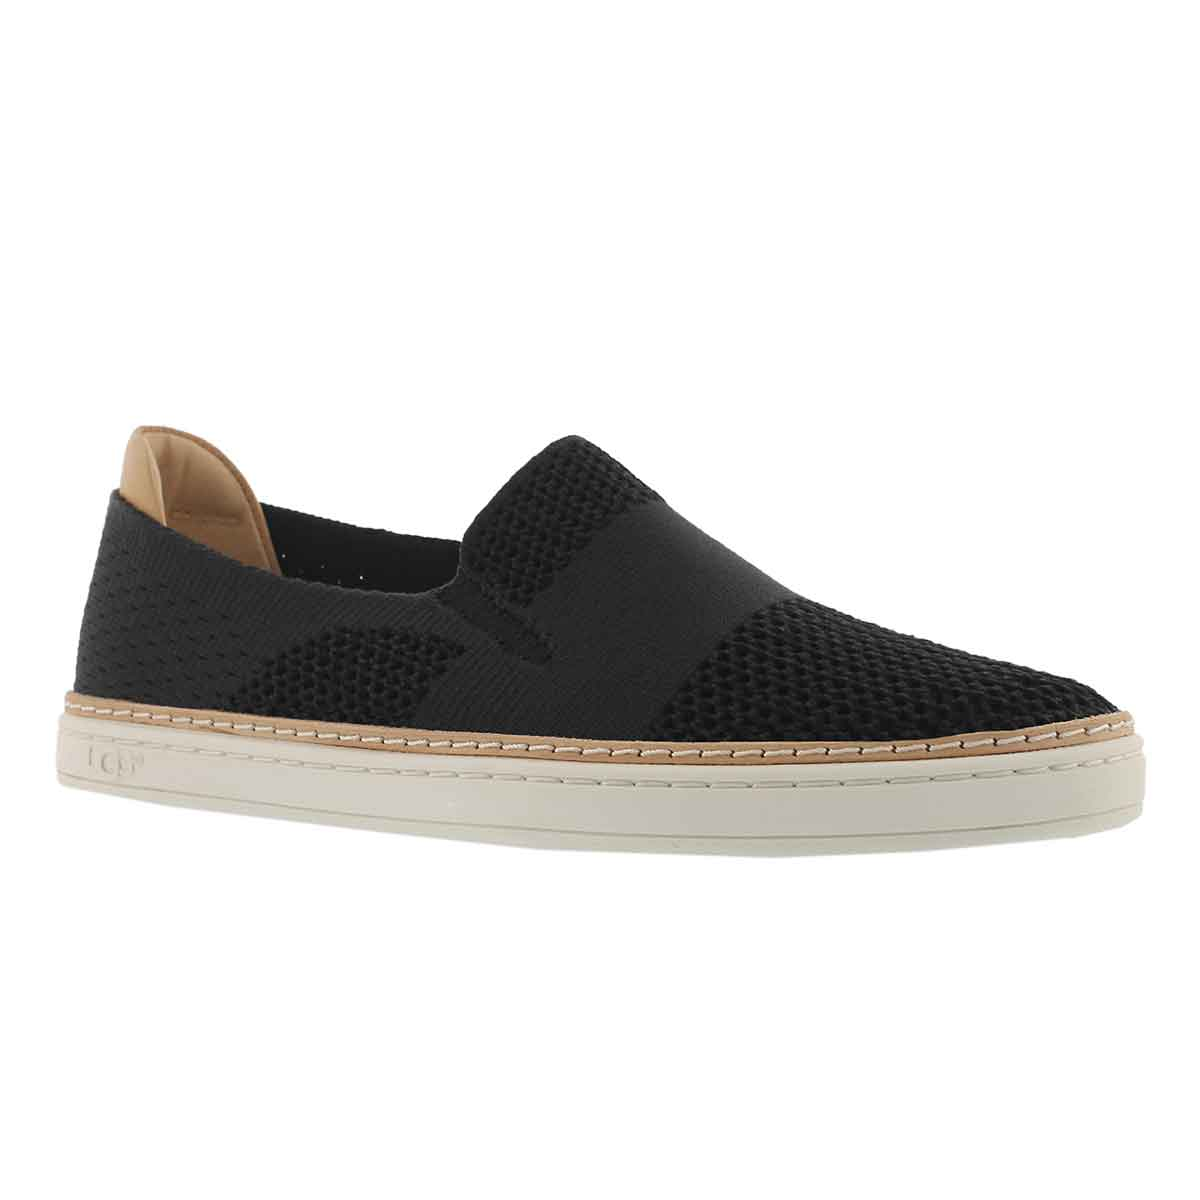 Women's SAMMY black casual slip on shoes